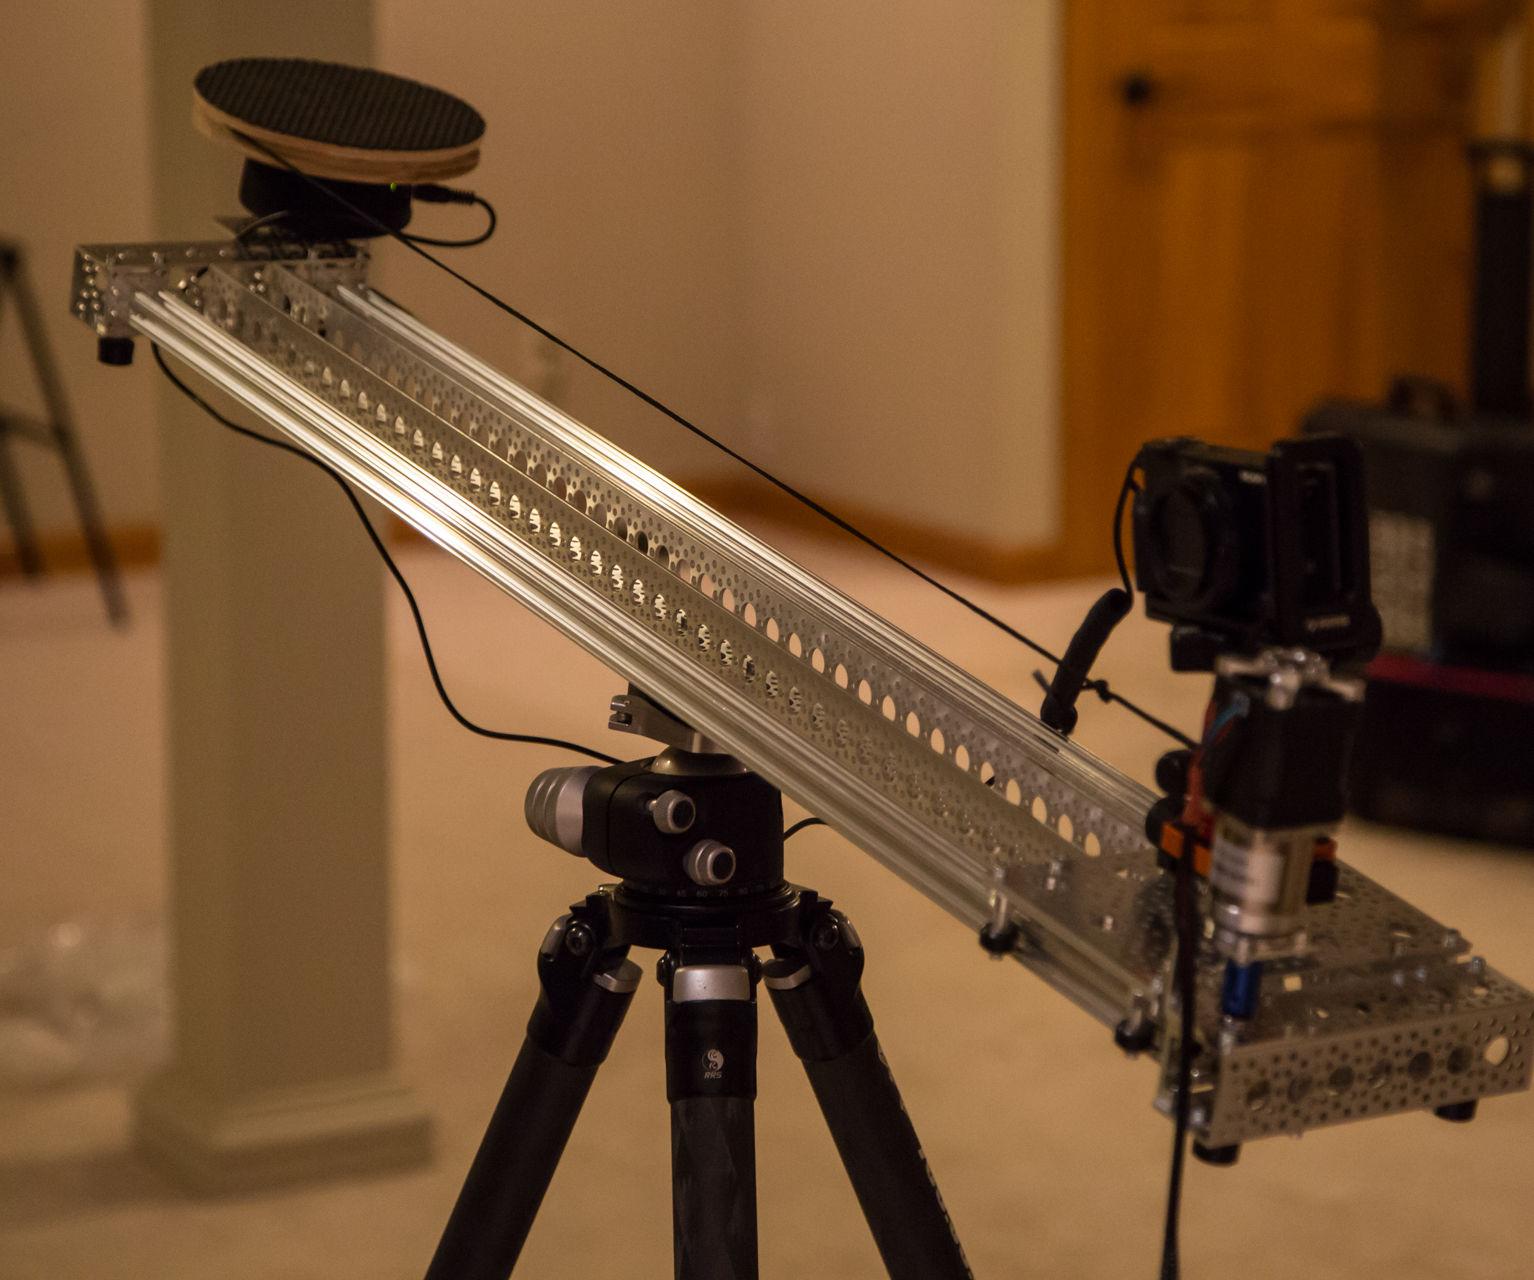 3ft DIY Actobotics Motorized Slider for Syrp Genie Mini:  Part II